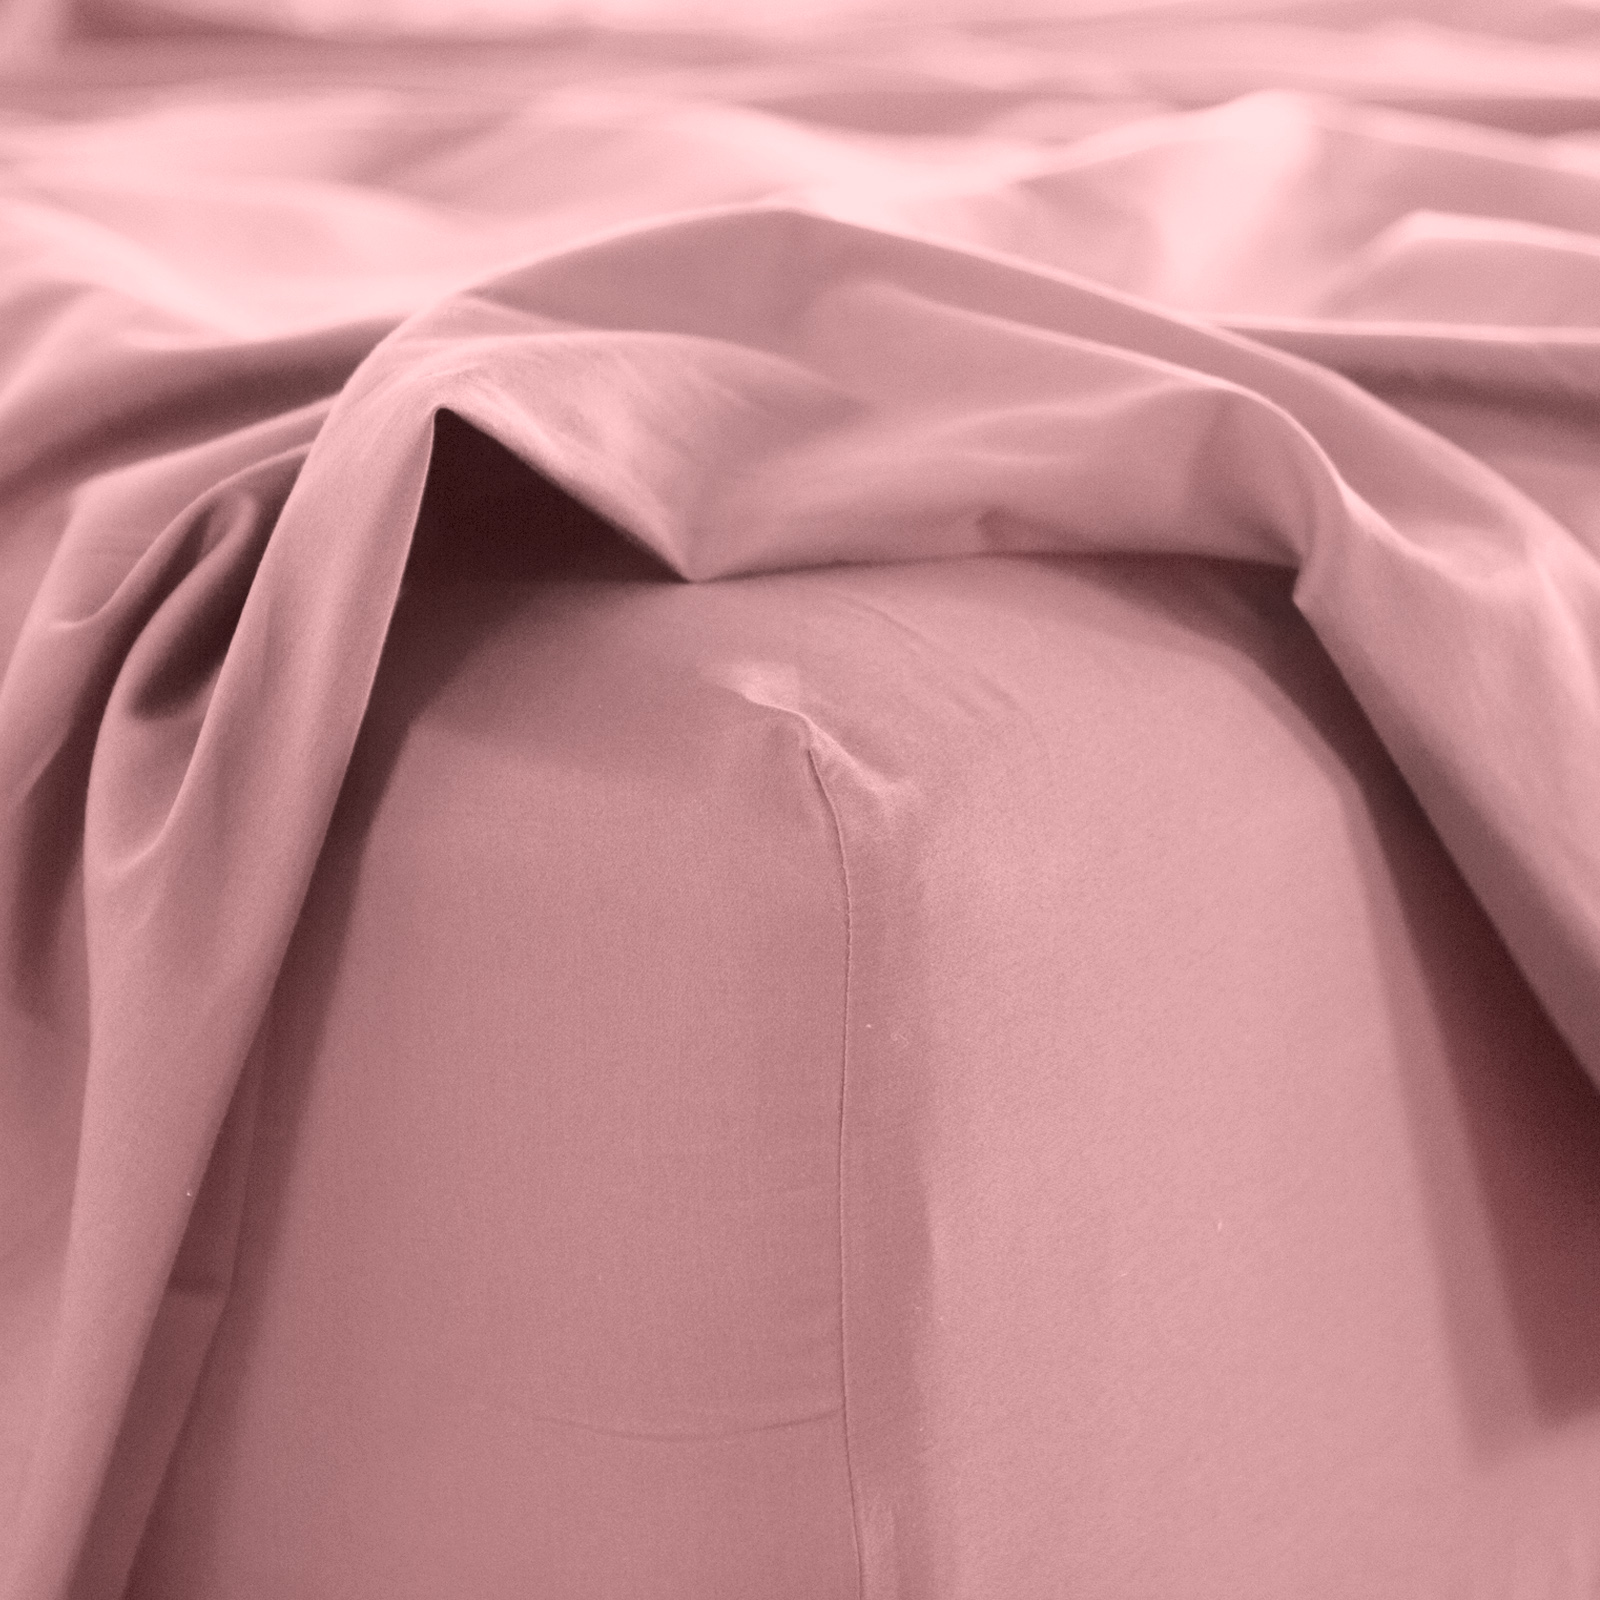 thumbnail 20 - Royal Comfort 1000TC Hotel Grade Bamboo Cotton Sheets Pillowcases Set Ultrasoft